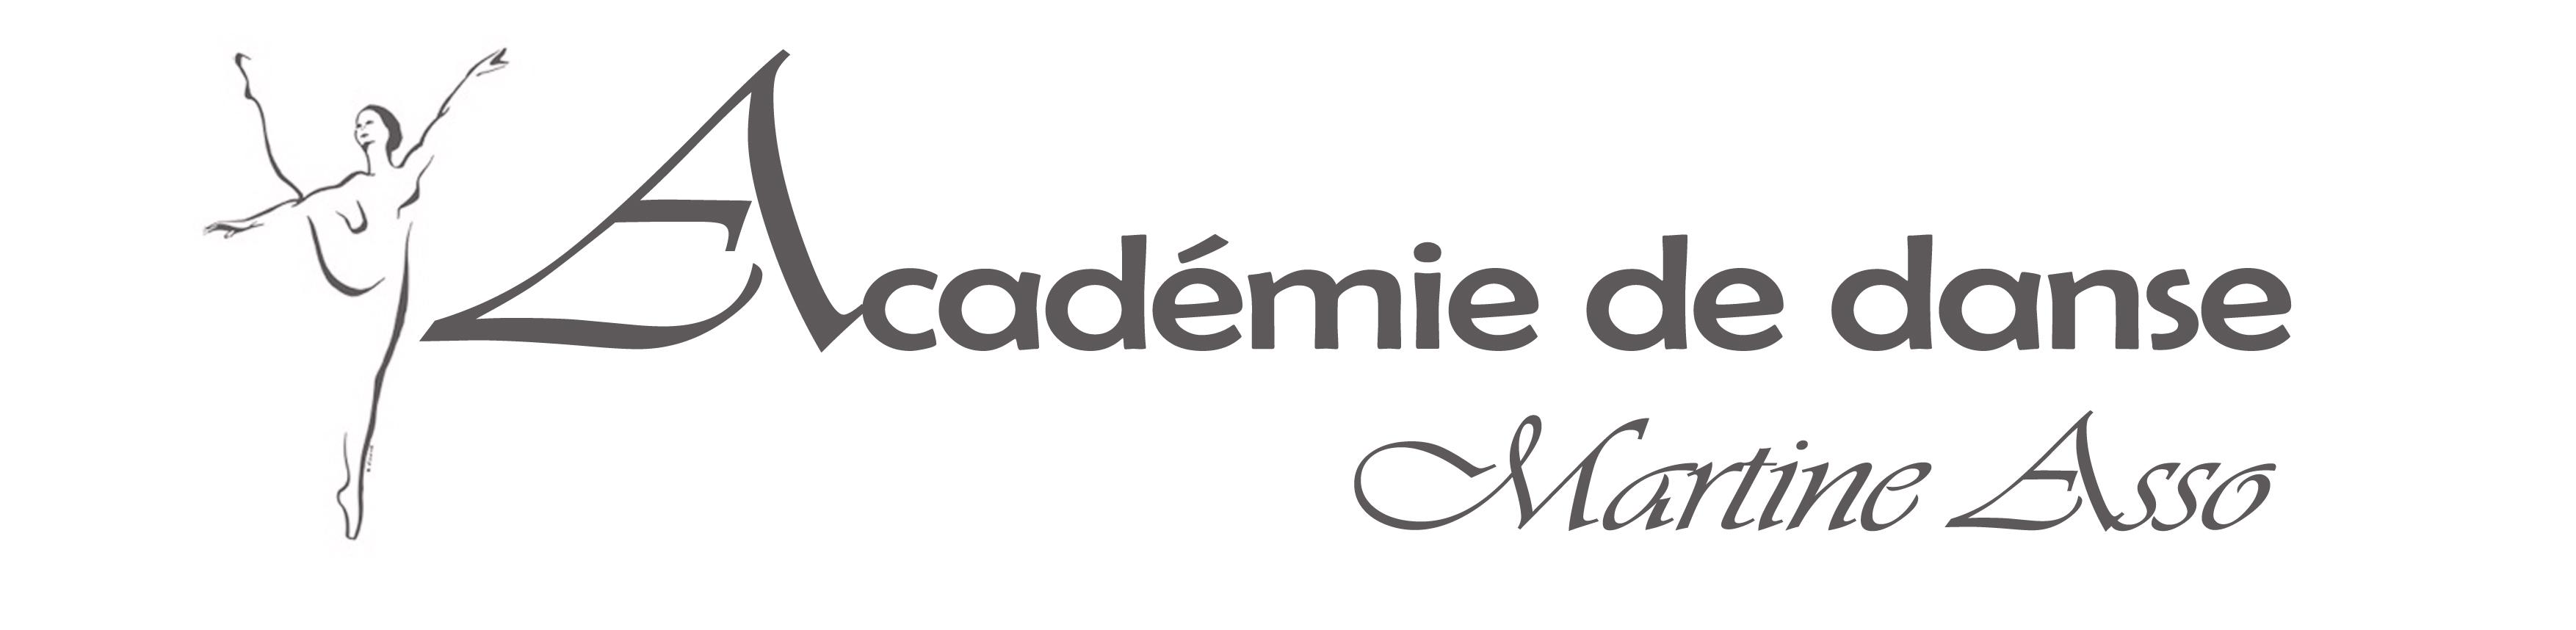 Academie de danse Martine Asso